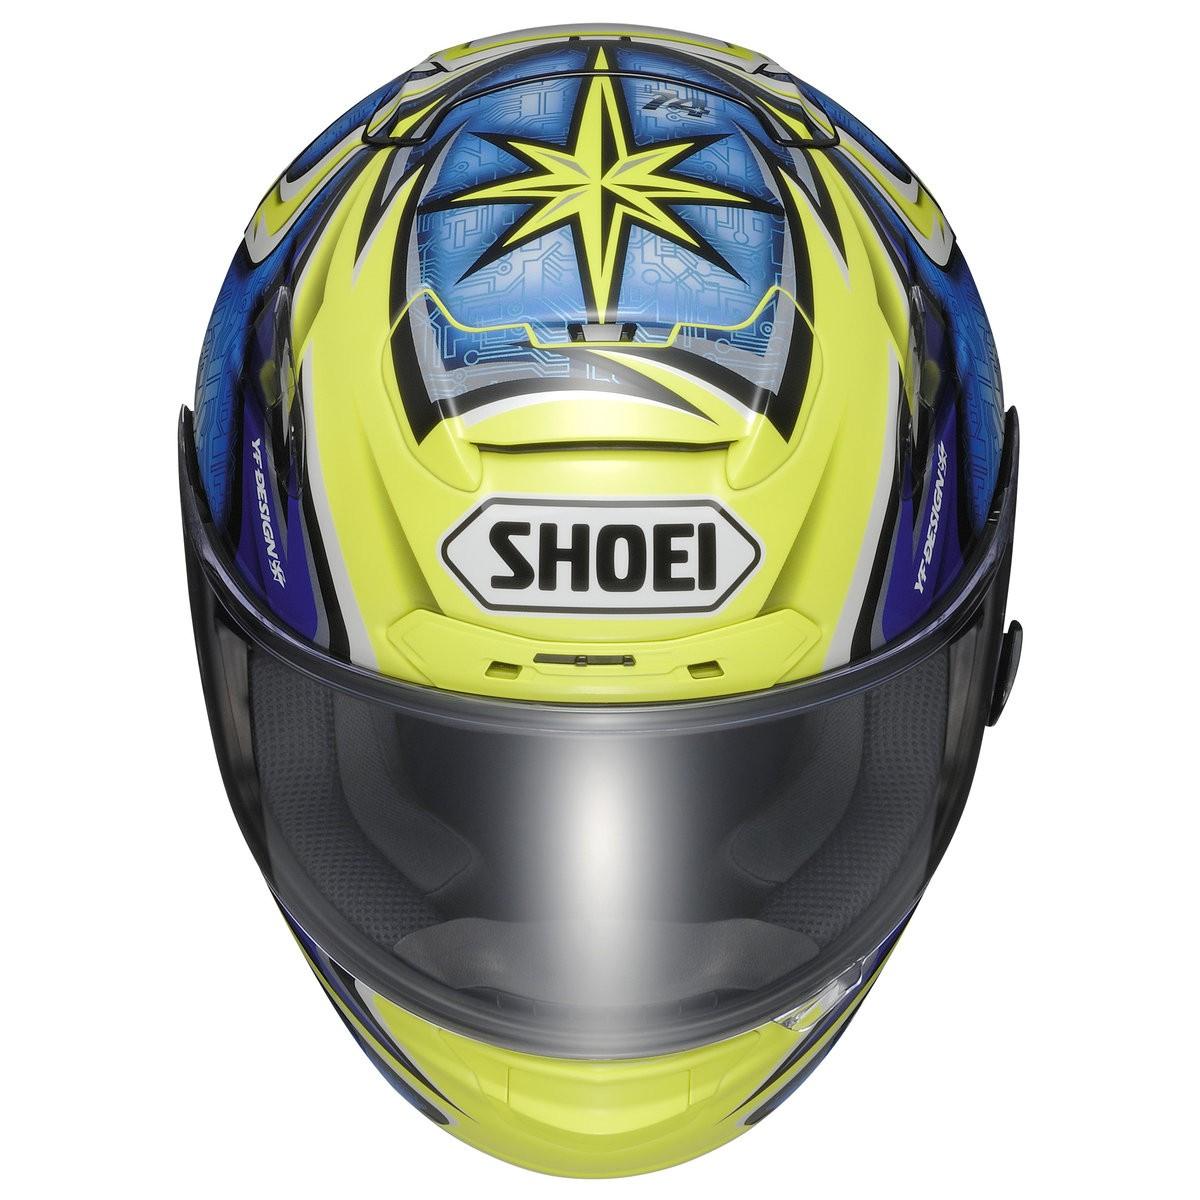 Shoei X-Twelve Daijiro Kato TC-2  - Motosports